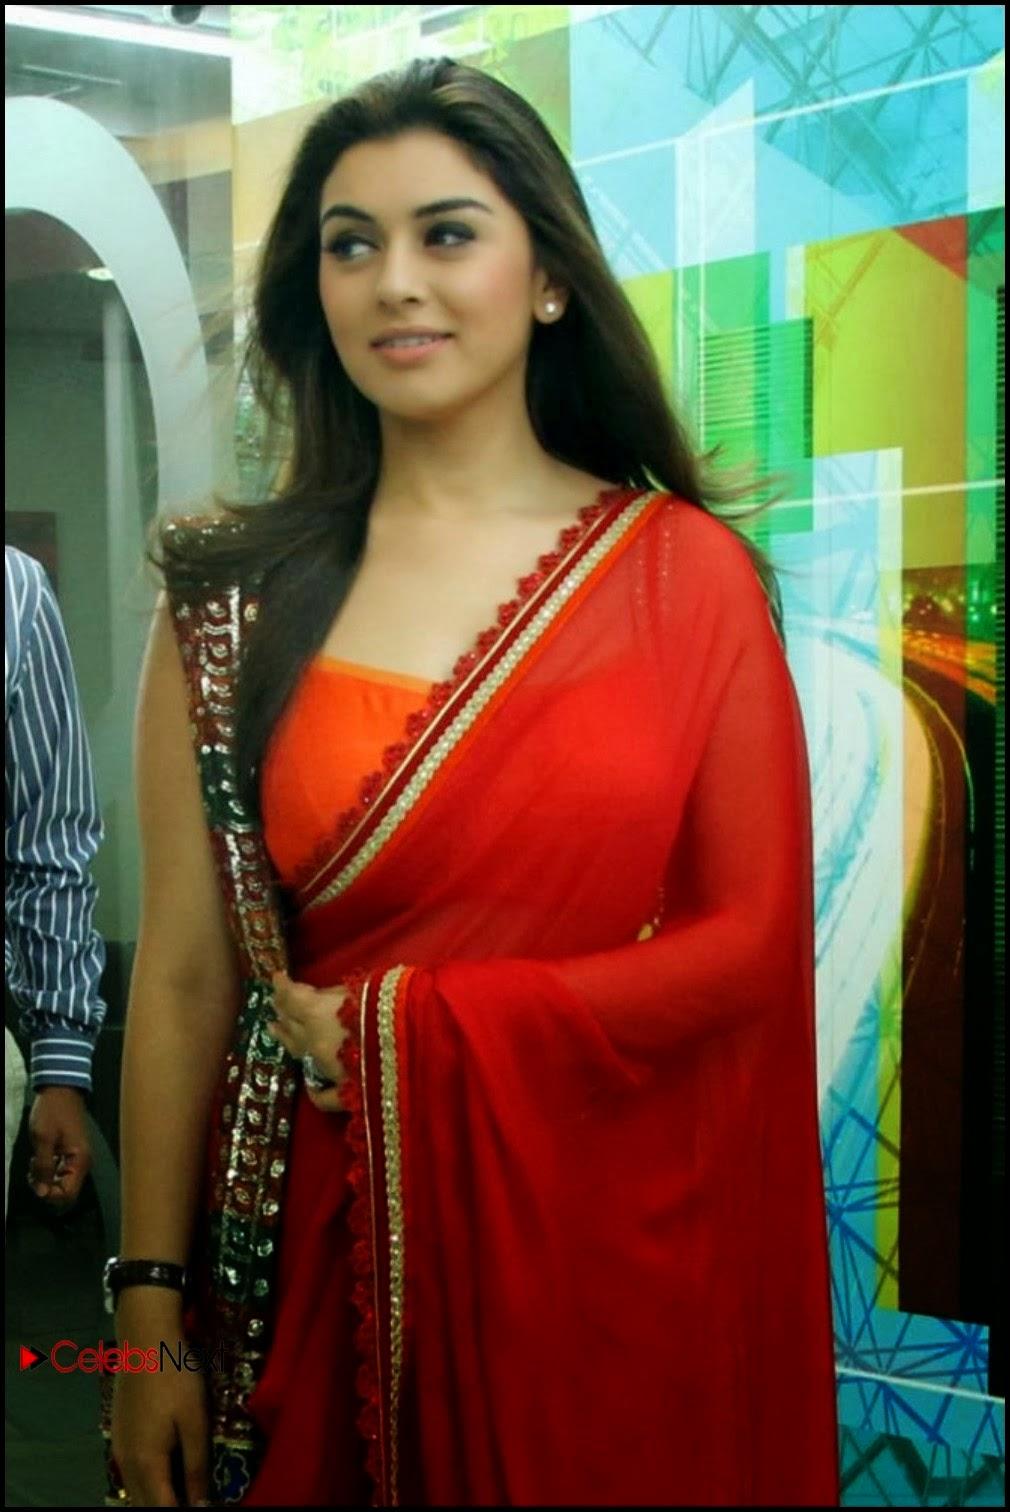 telugu actress in red saree stills , Tollywood actress photo gallery